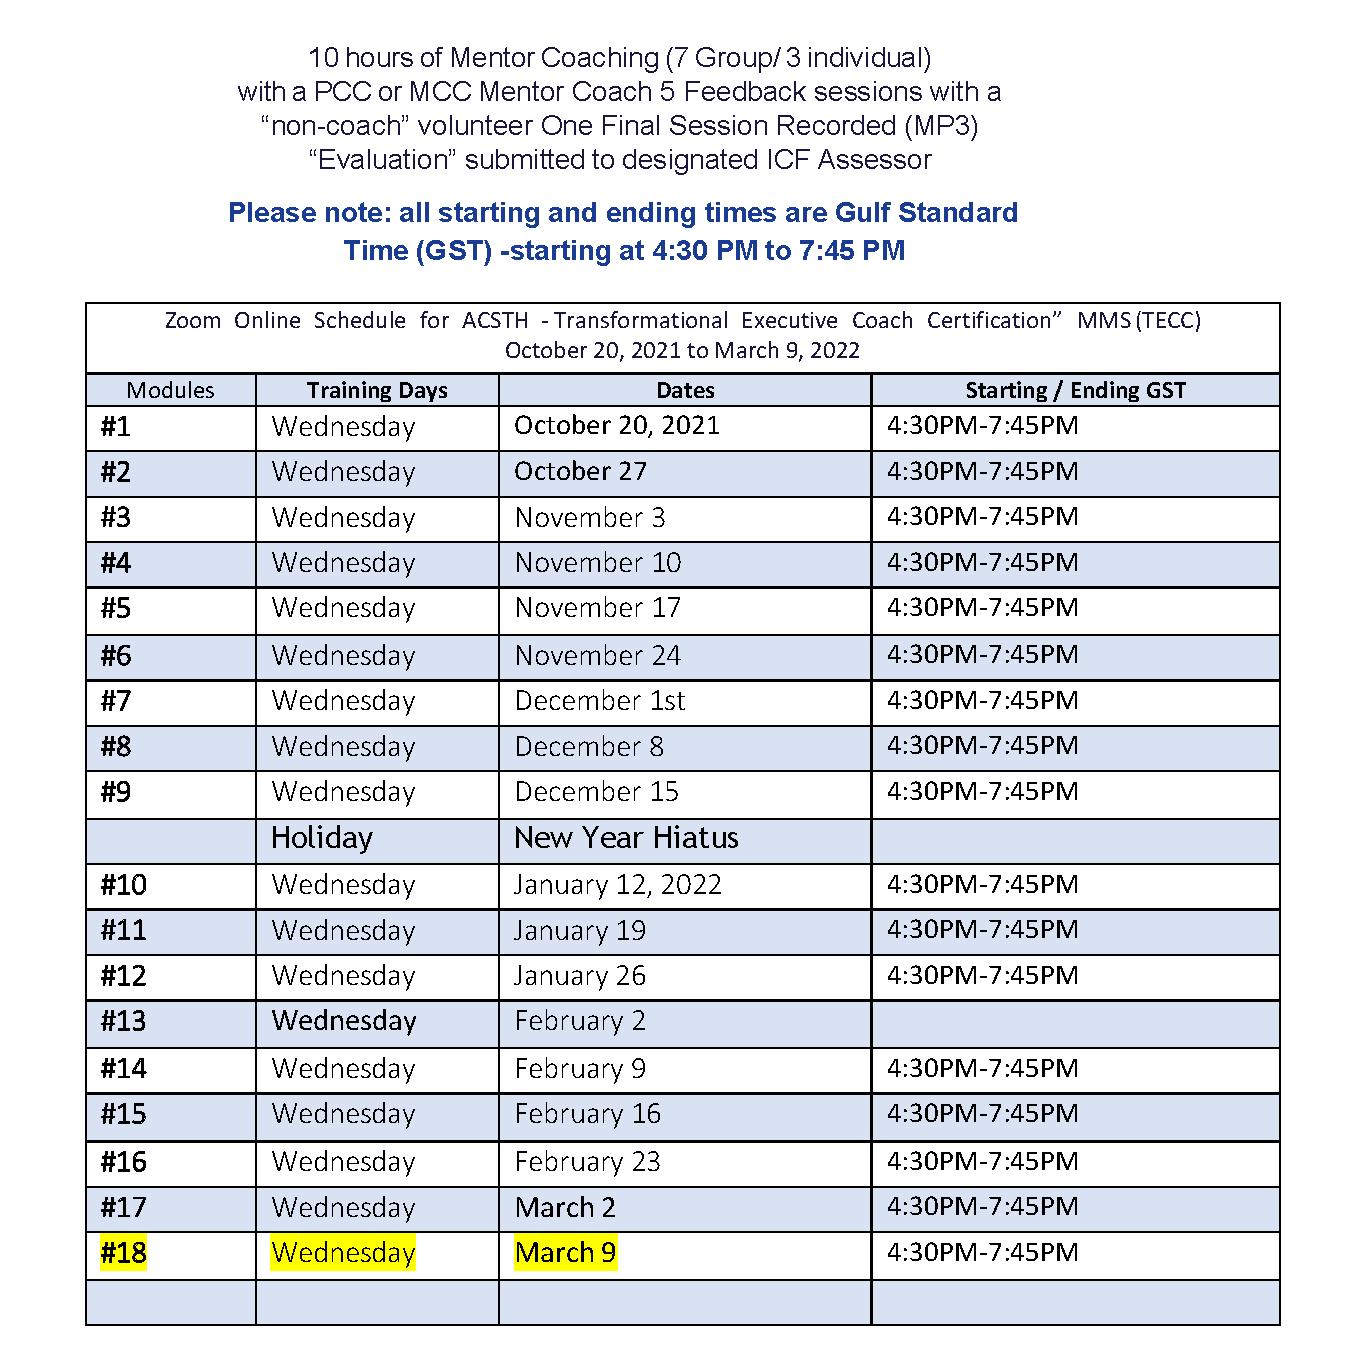 TECC ACSTH Oct 20 Schedule